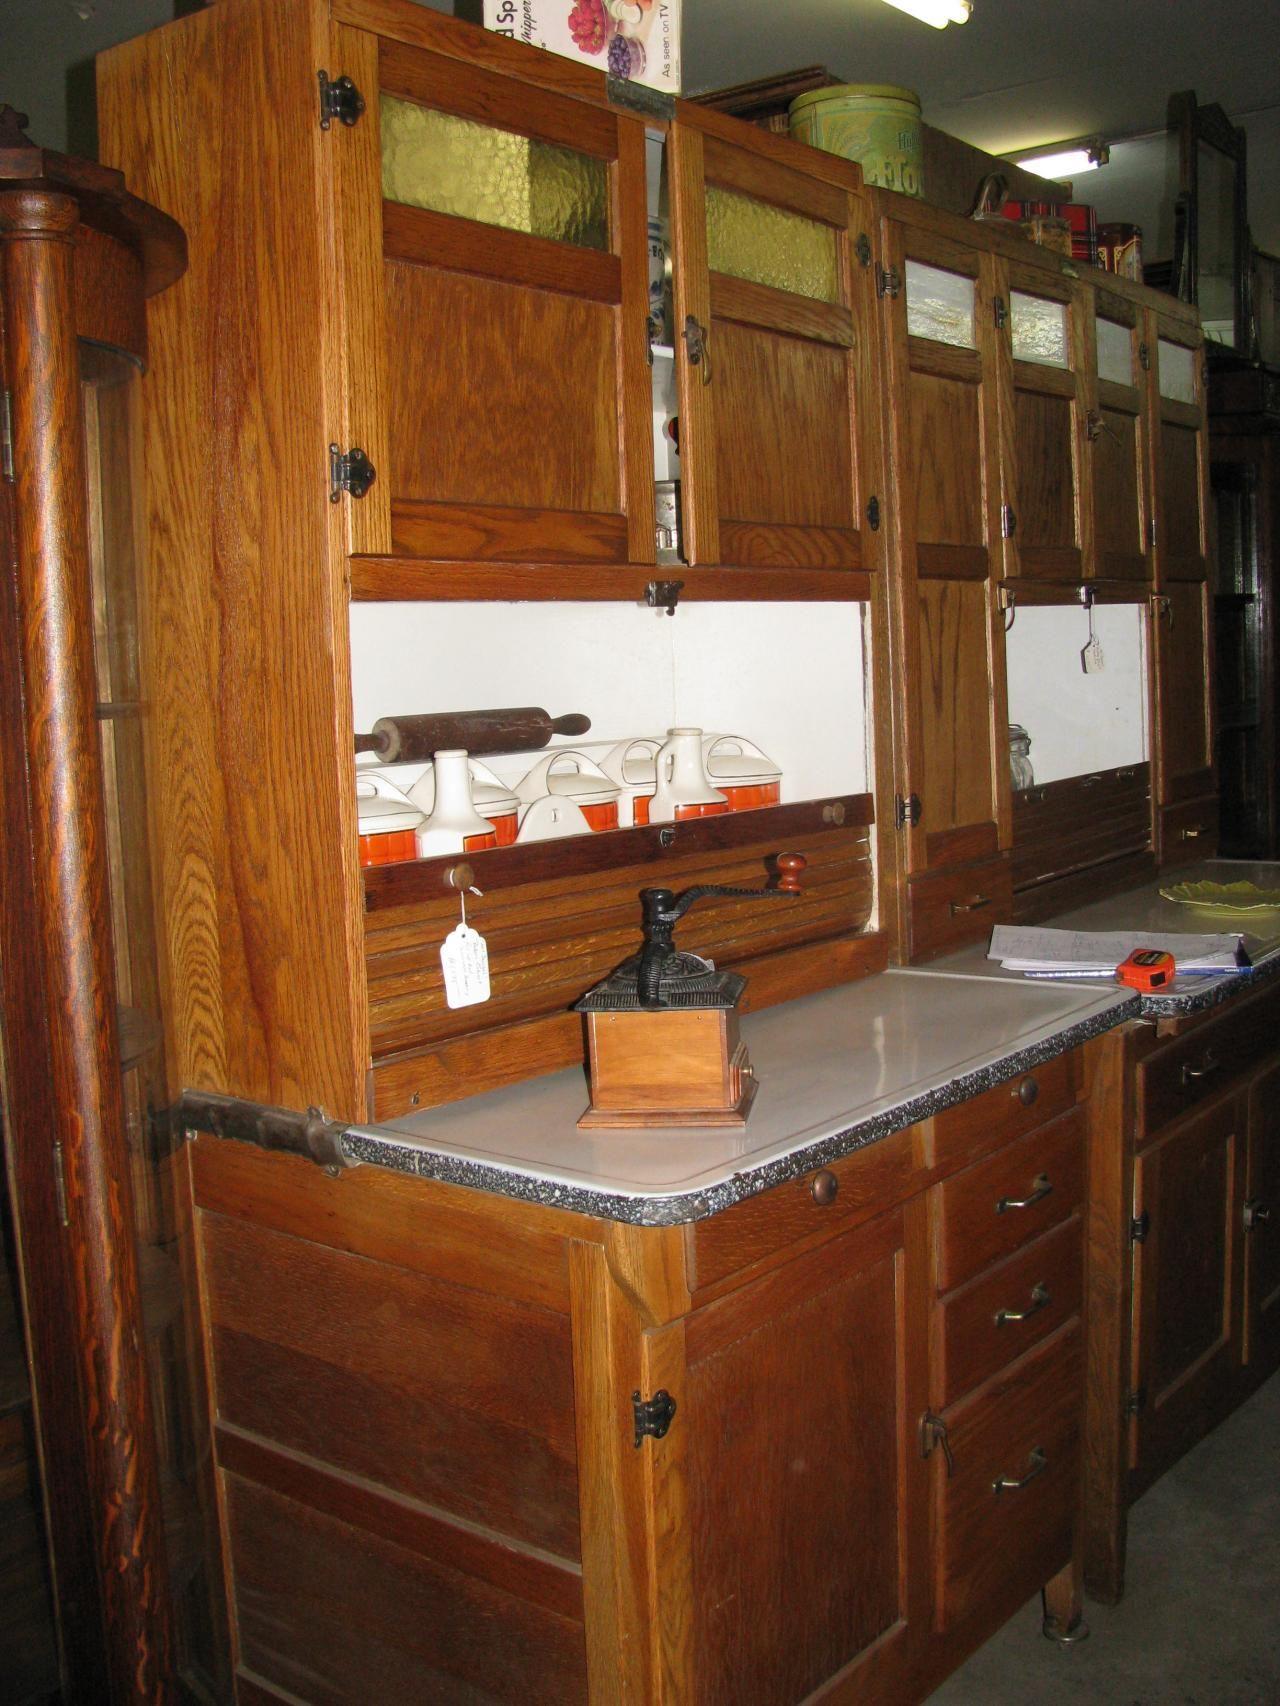 Küche Kabinett hardware massachusetts   Komplette Kabinett Resurfacing Mit dem Cabinet Hardware ...